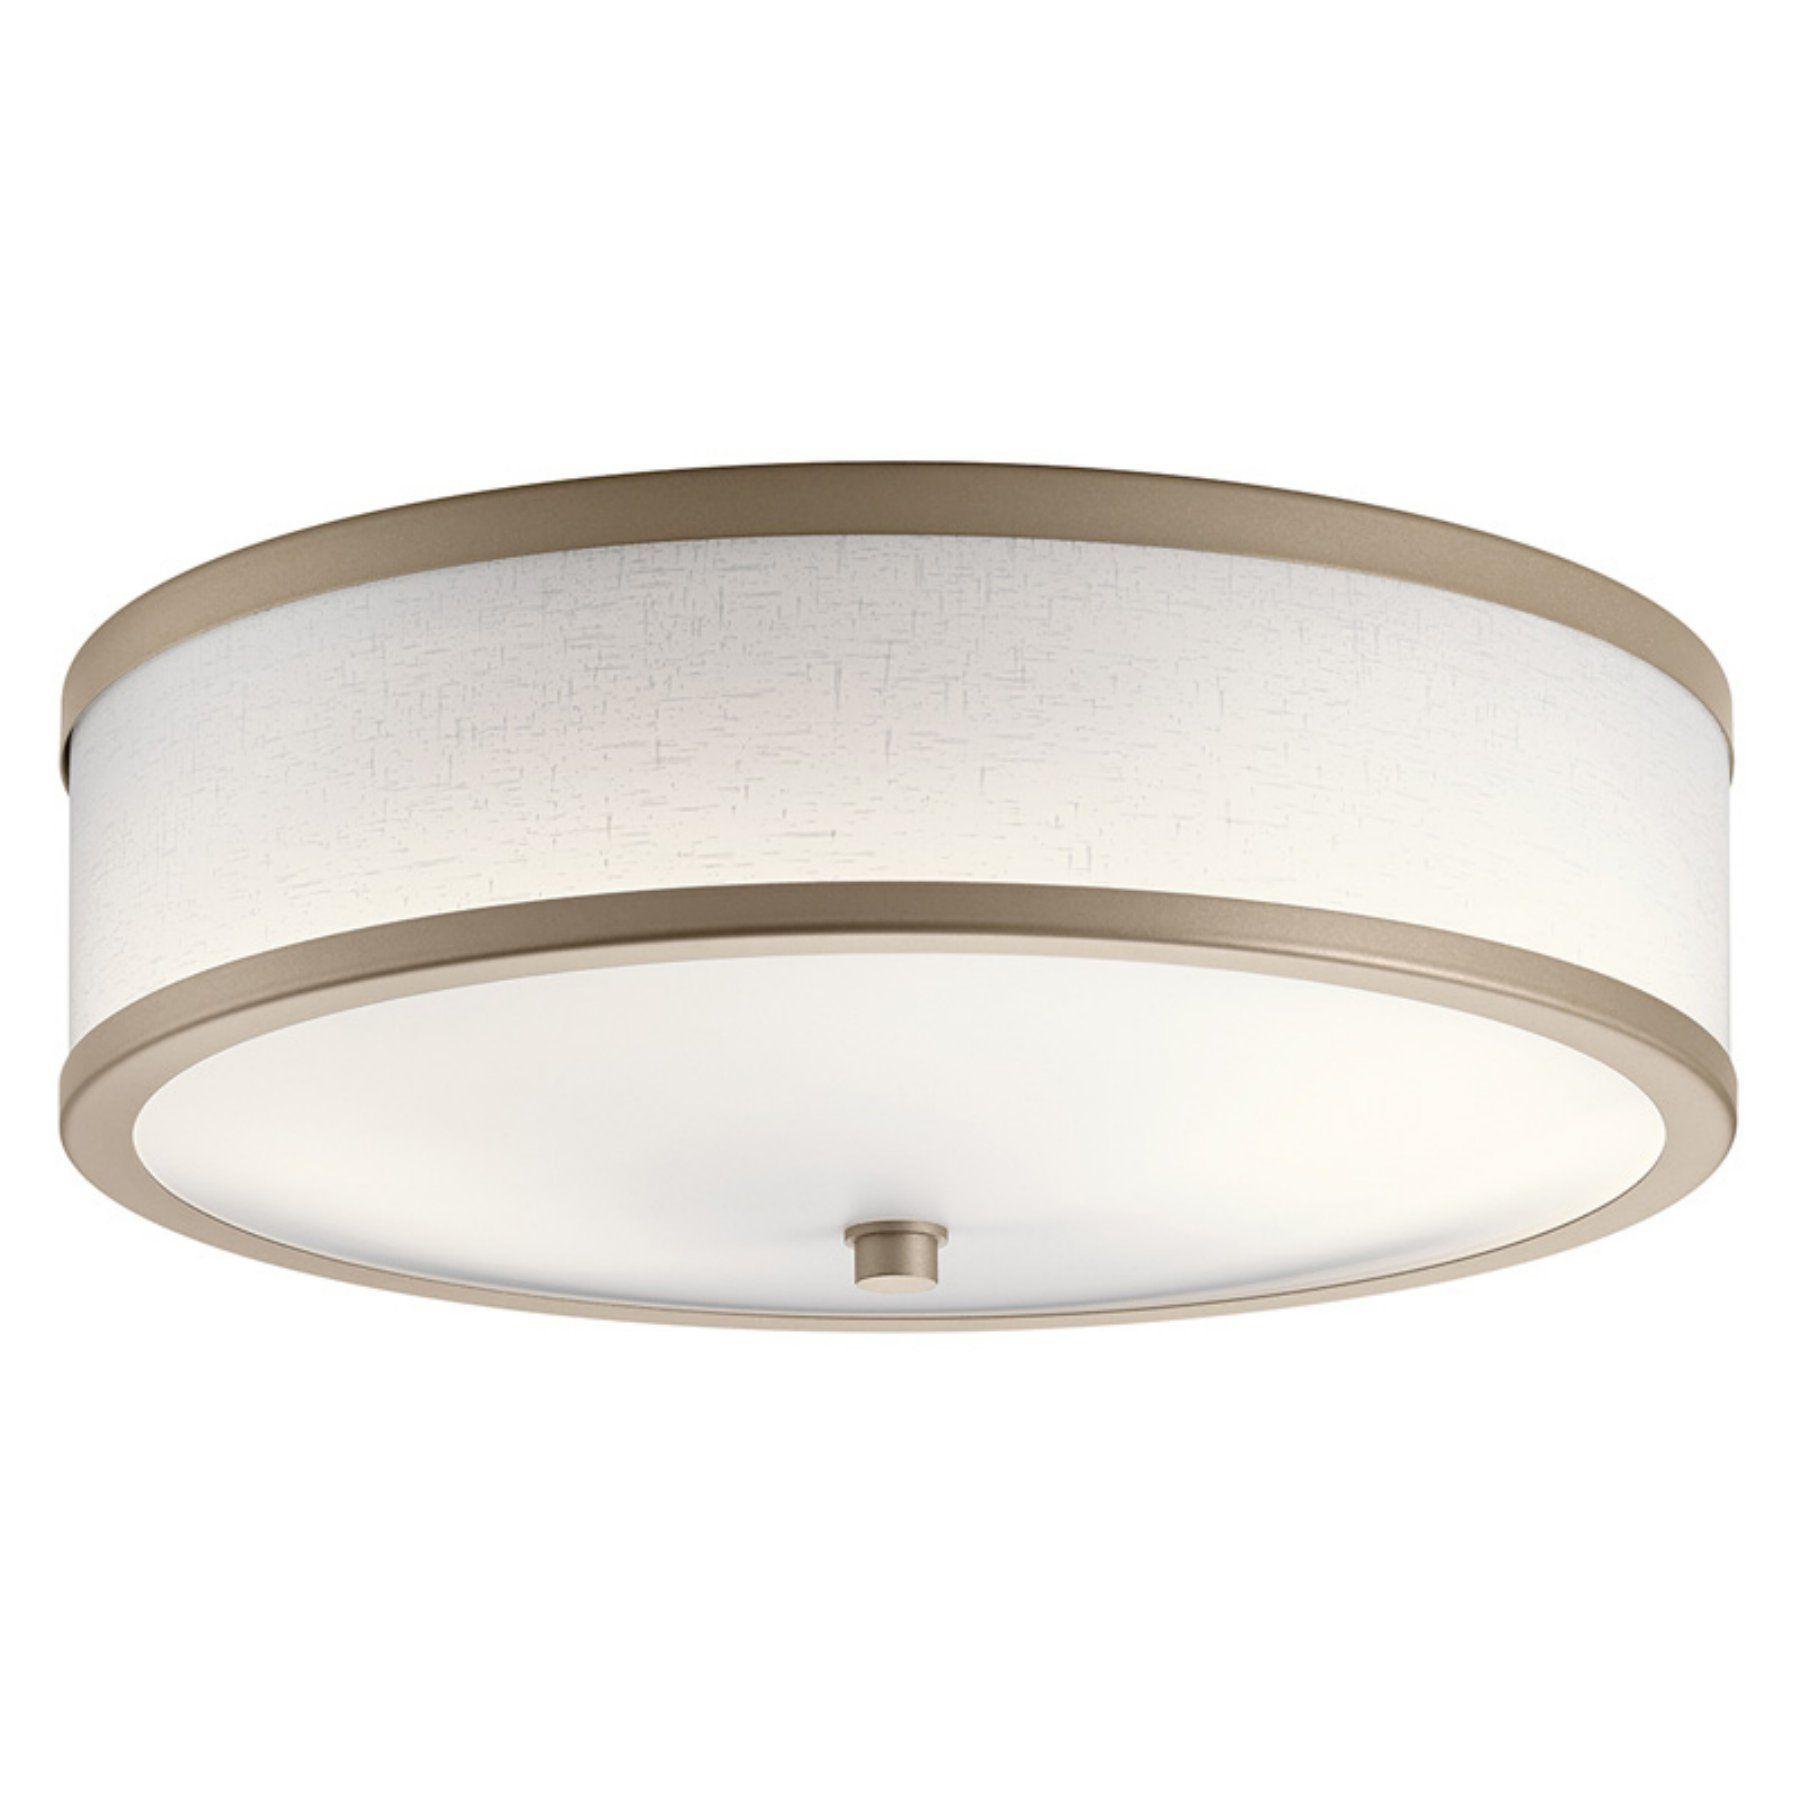 Hallway flush mount lighting  Kichler  Flush Mount Light  CP  Flush mount lighting and